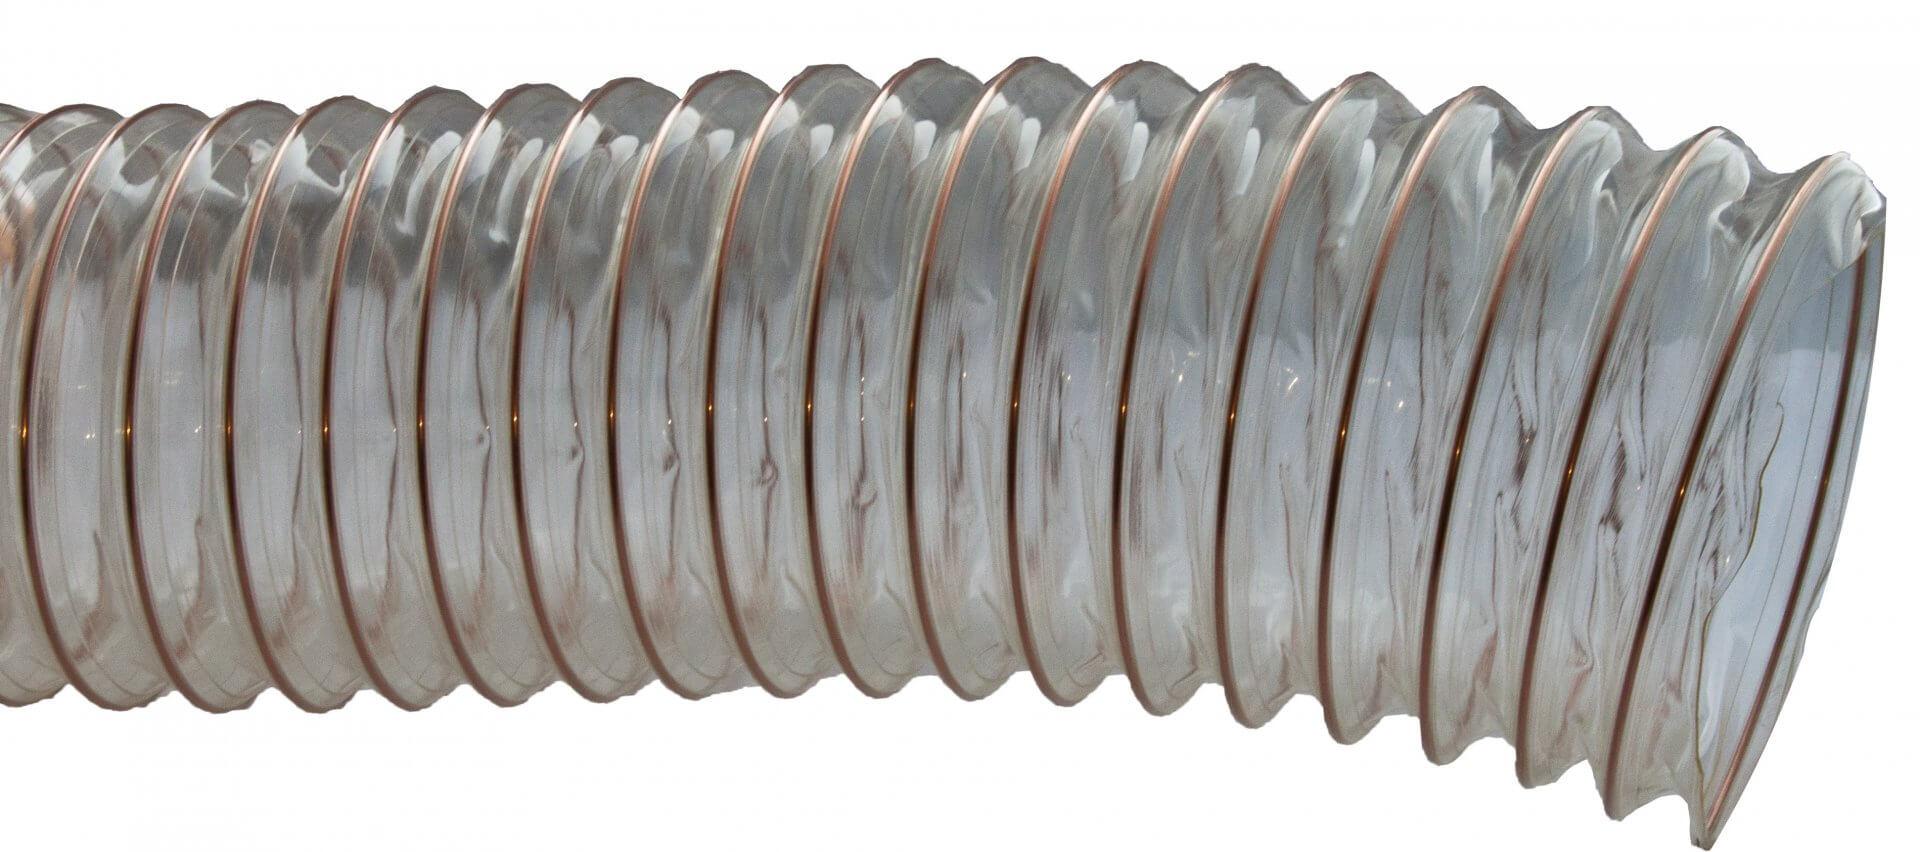 Puruletku P2PU 6m (koot 40-100 mm) - Kailatec Oy Verkkokauppa